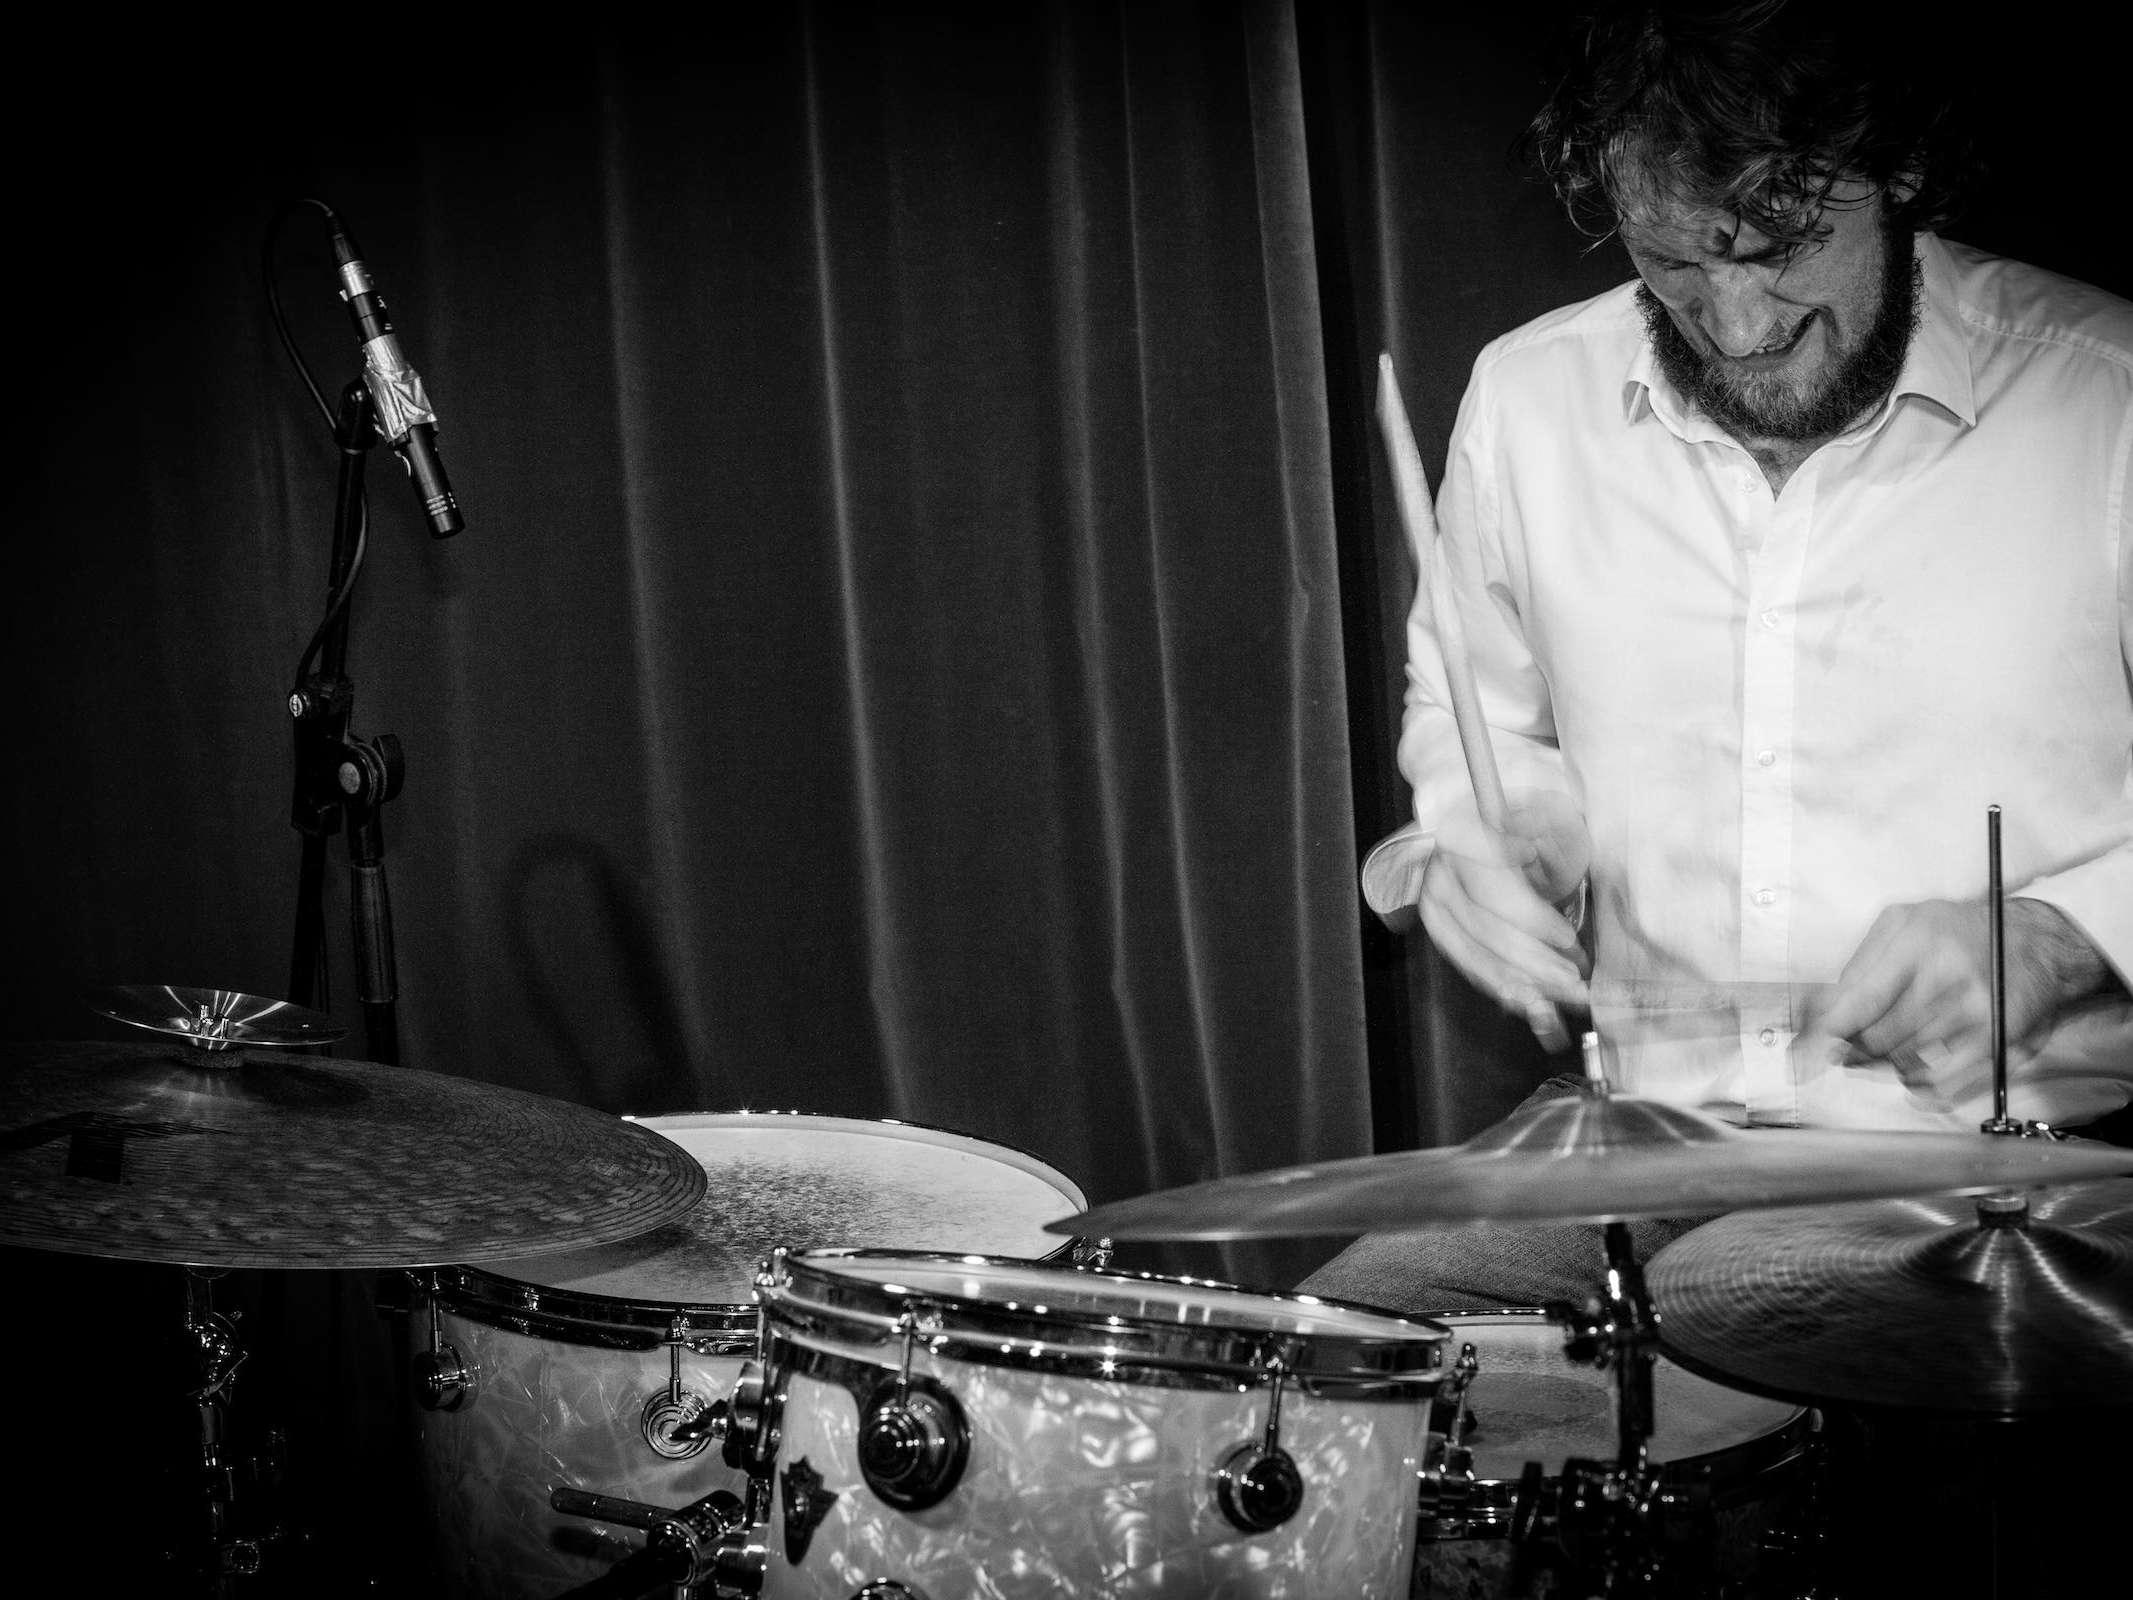 Band | Hannover | Liveband |Livemusik | Walking | Act |Partyband |Popband | Jazzband |Swingband |Messeparty |Lounge |Soul |Popmusik |Jazz | Schlagzeug |Drummer |Drums | Hochzeit |Messe |Firmenfeier | Charity |Gala |Buchen